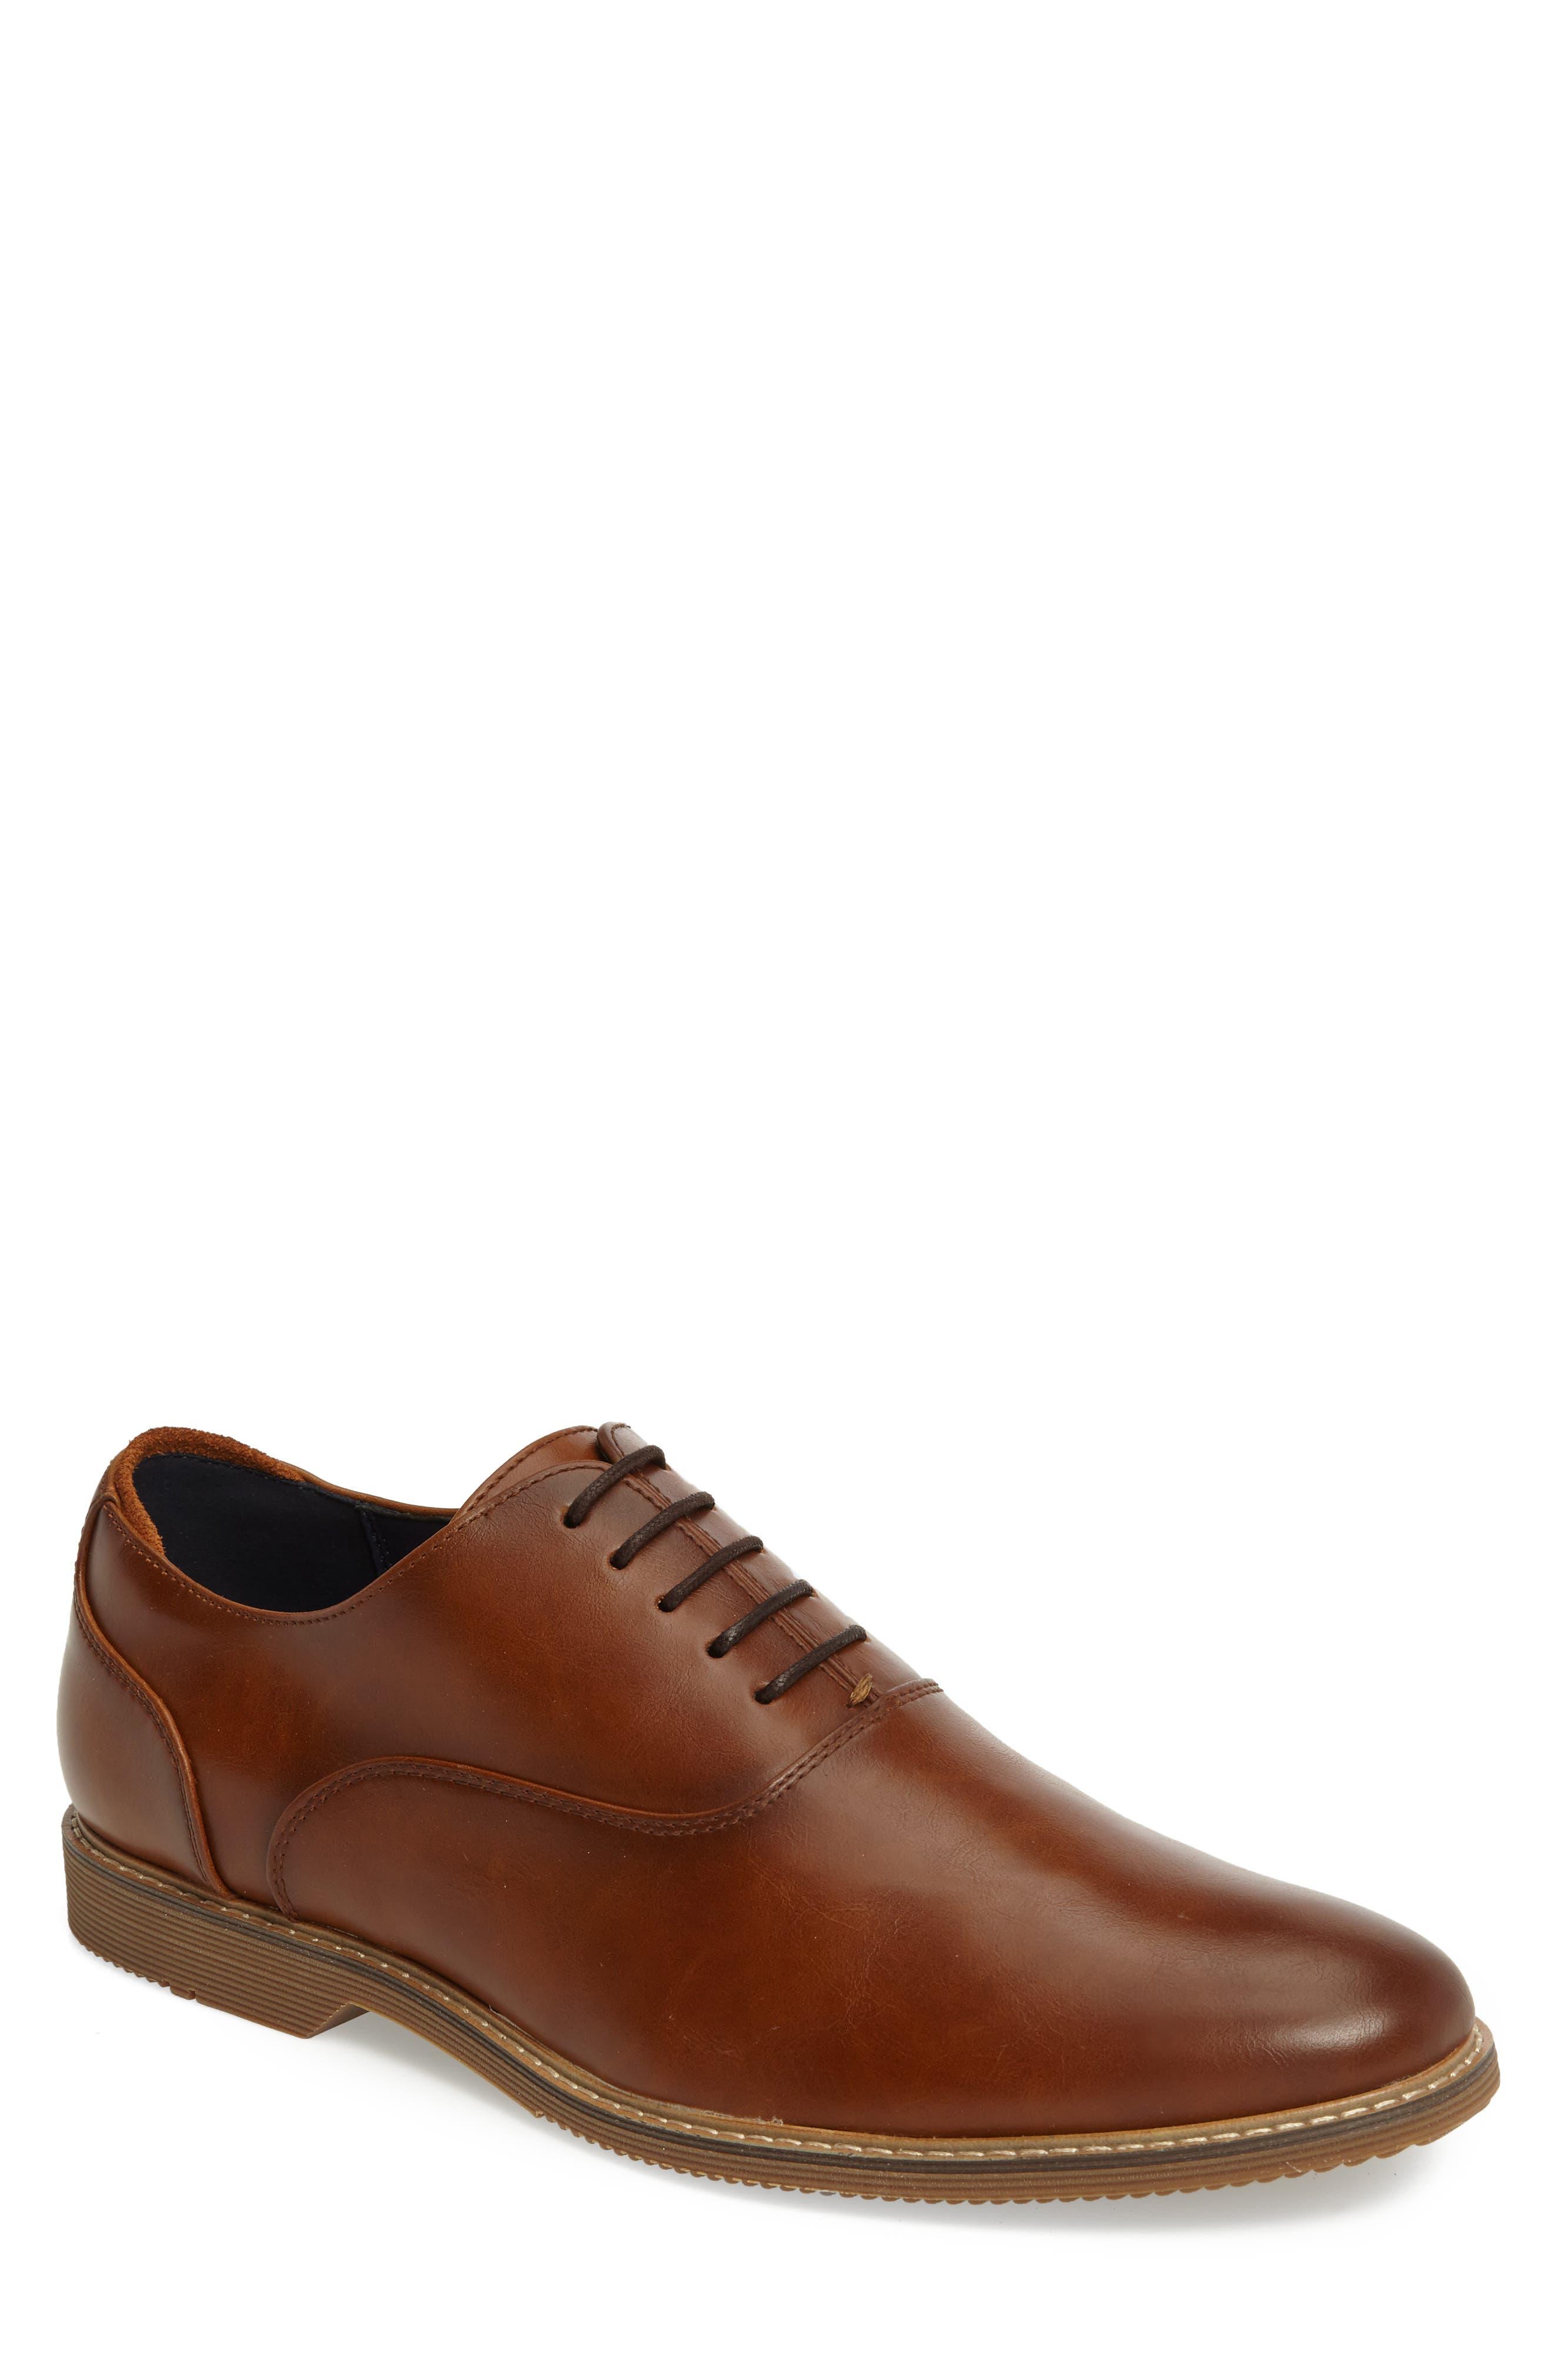 Nunan Plain Toe Oxford,                         Main,                         color, TAN